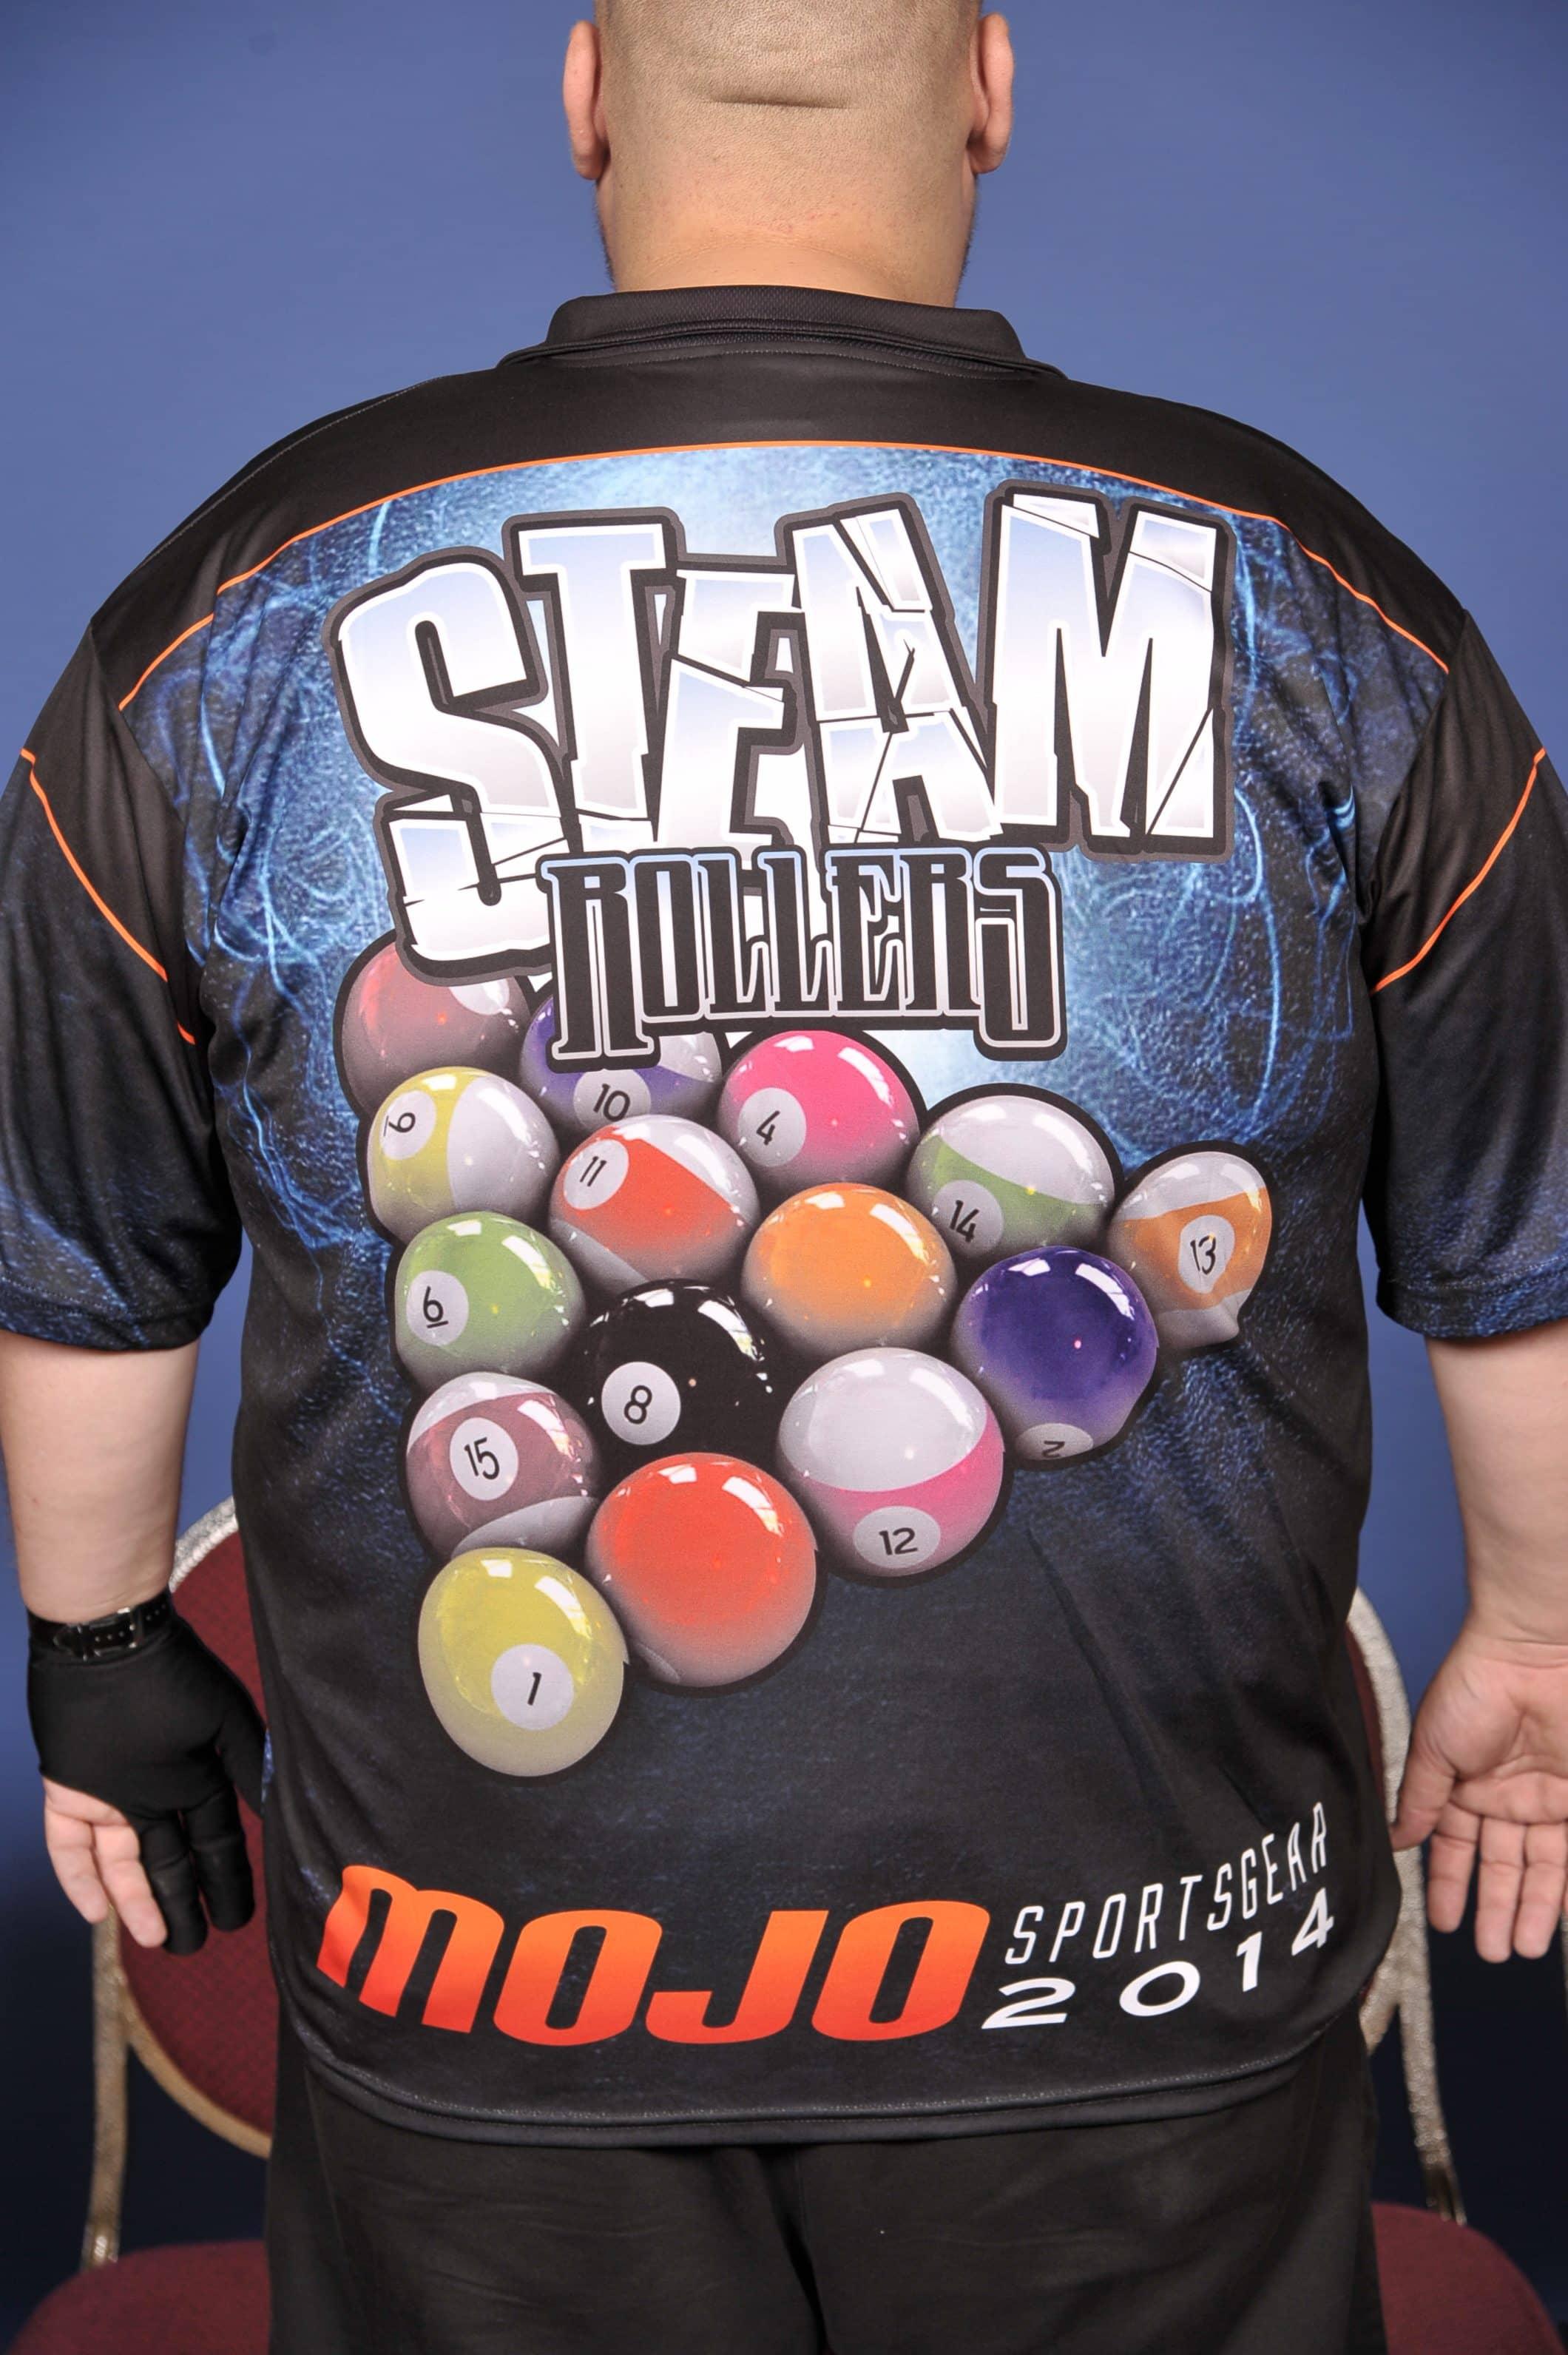 2014 8Ball Team Shirt Contest Winners  American